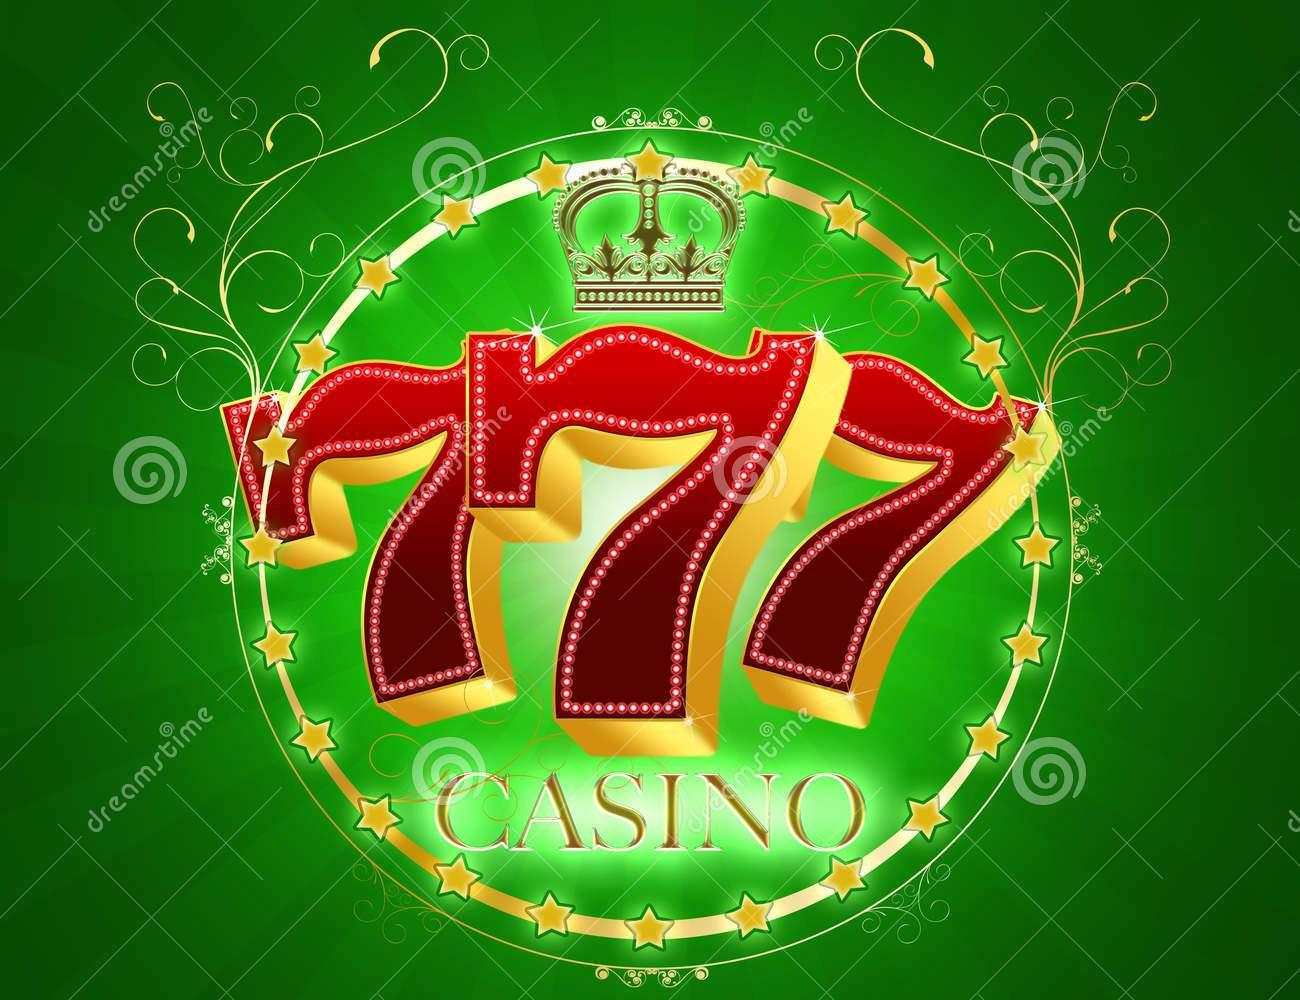 casino 777 promotie code